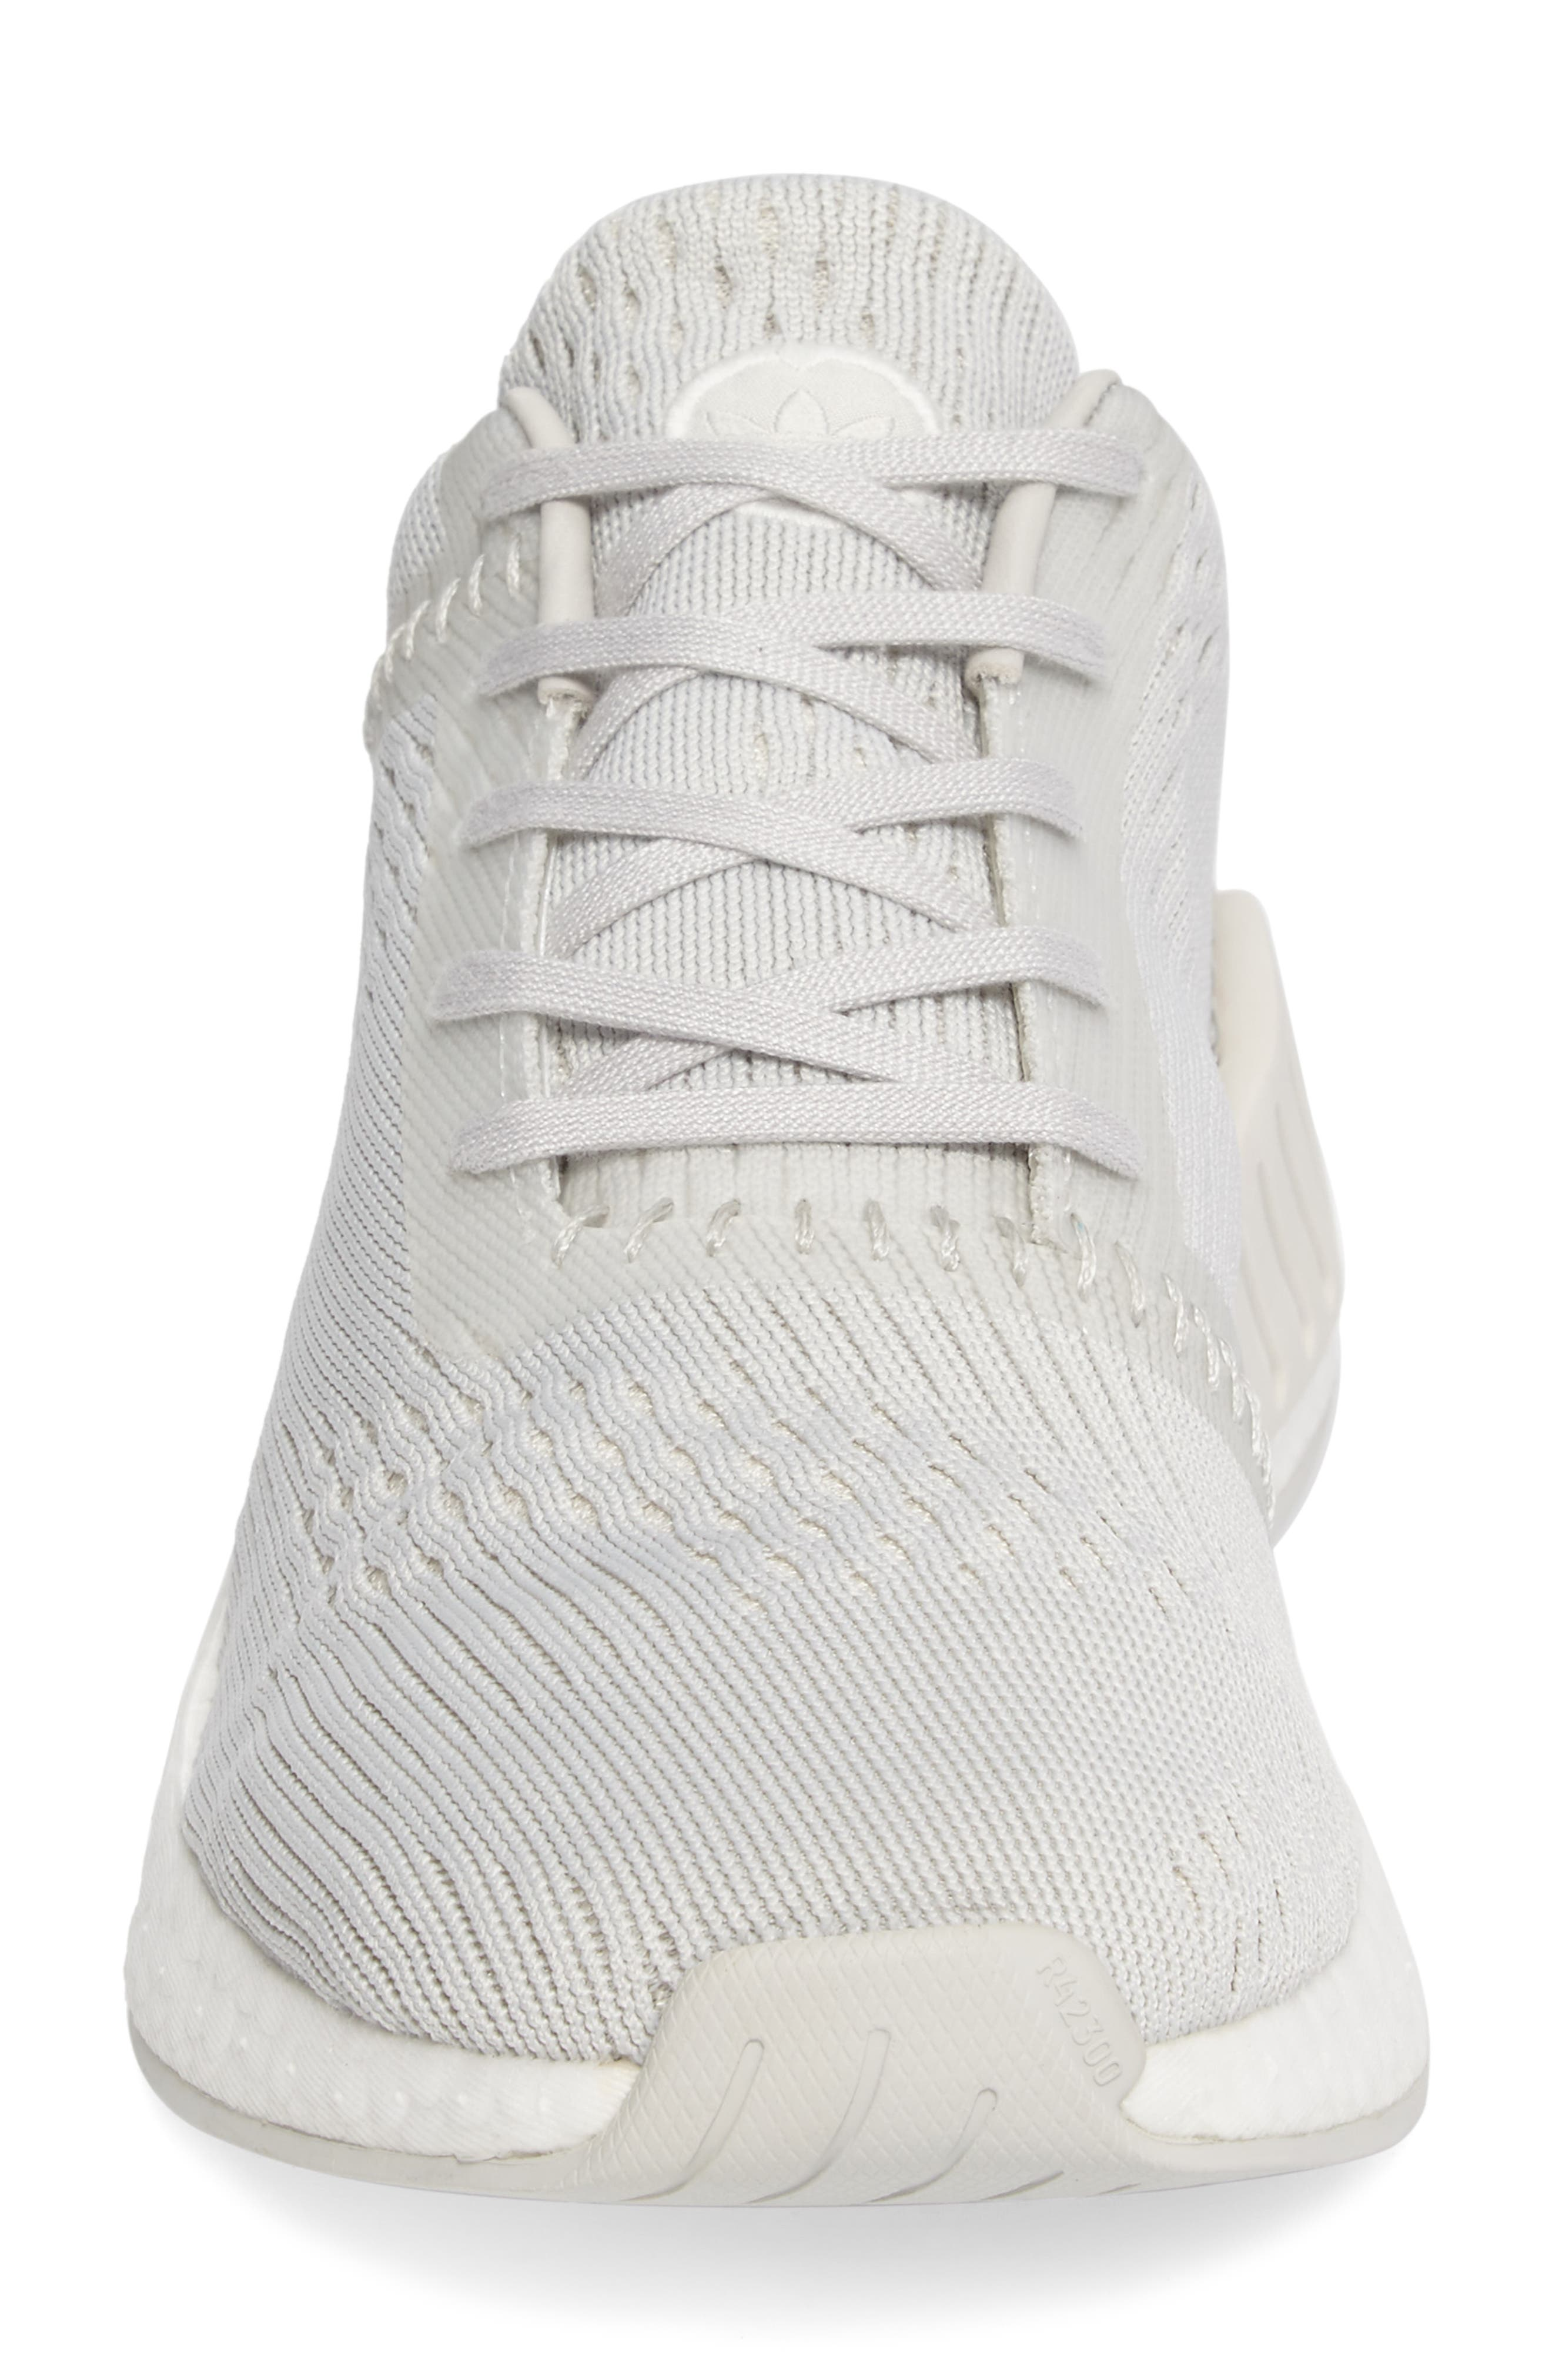 Nomad R2 Sneaker,                             Alternate thumbnail 4, color,                             025